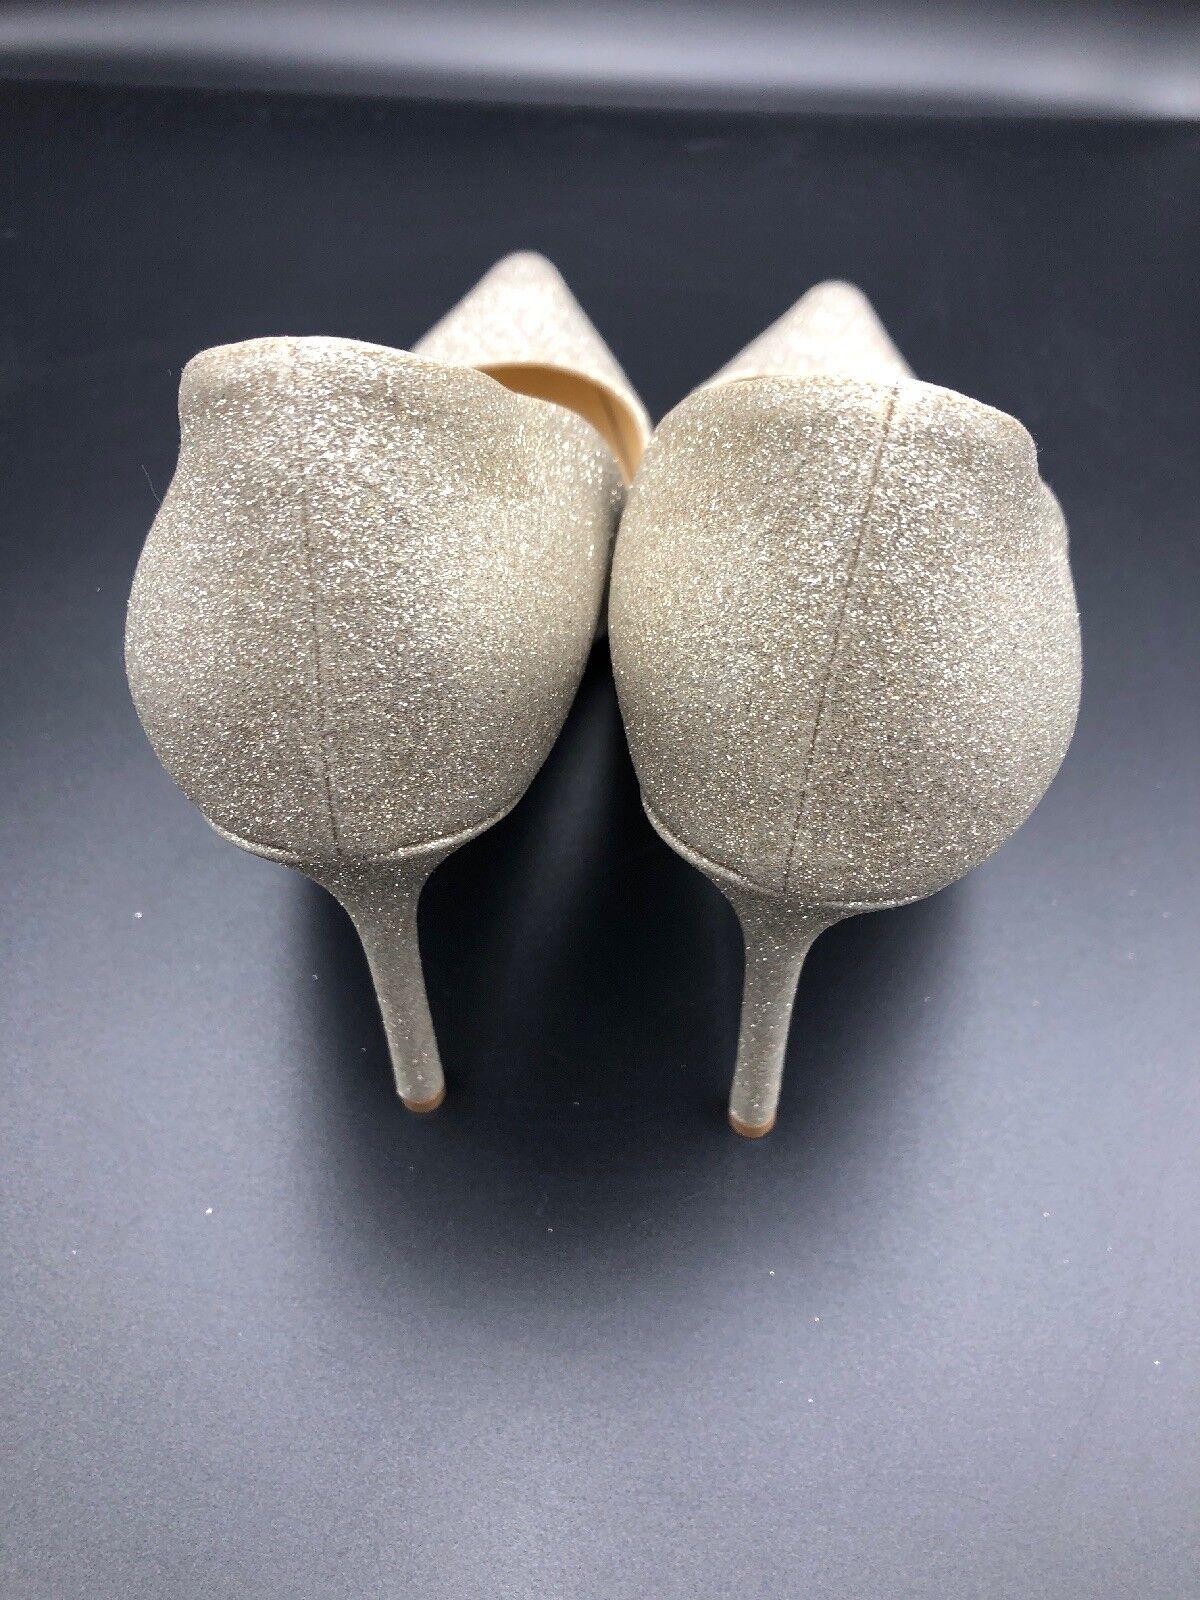 Jimmy Choo Romy 100 Dusty Glace Argent Paillettes Paillettes Paillettes Talons Hauts Pompe Stiletto UK 7 EU 40 365495